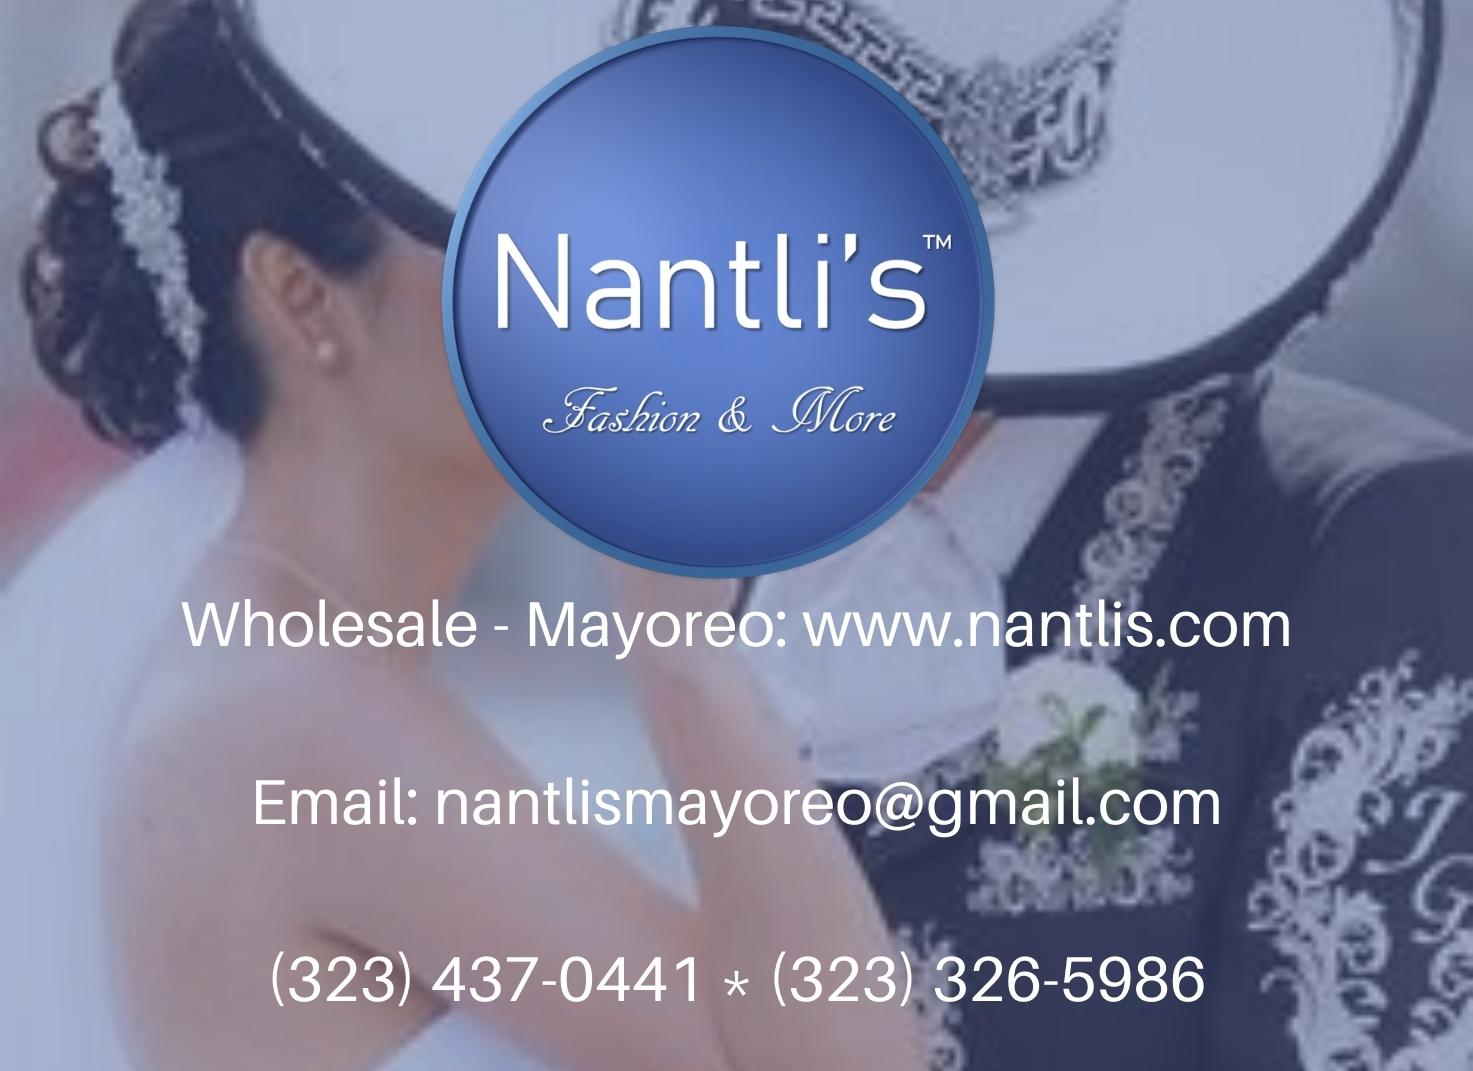 Nantlis Vol WE2 Bodas y Fiestas - Weddings and Parties Page-34